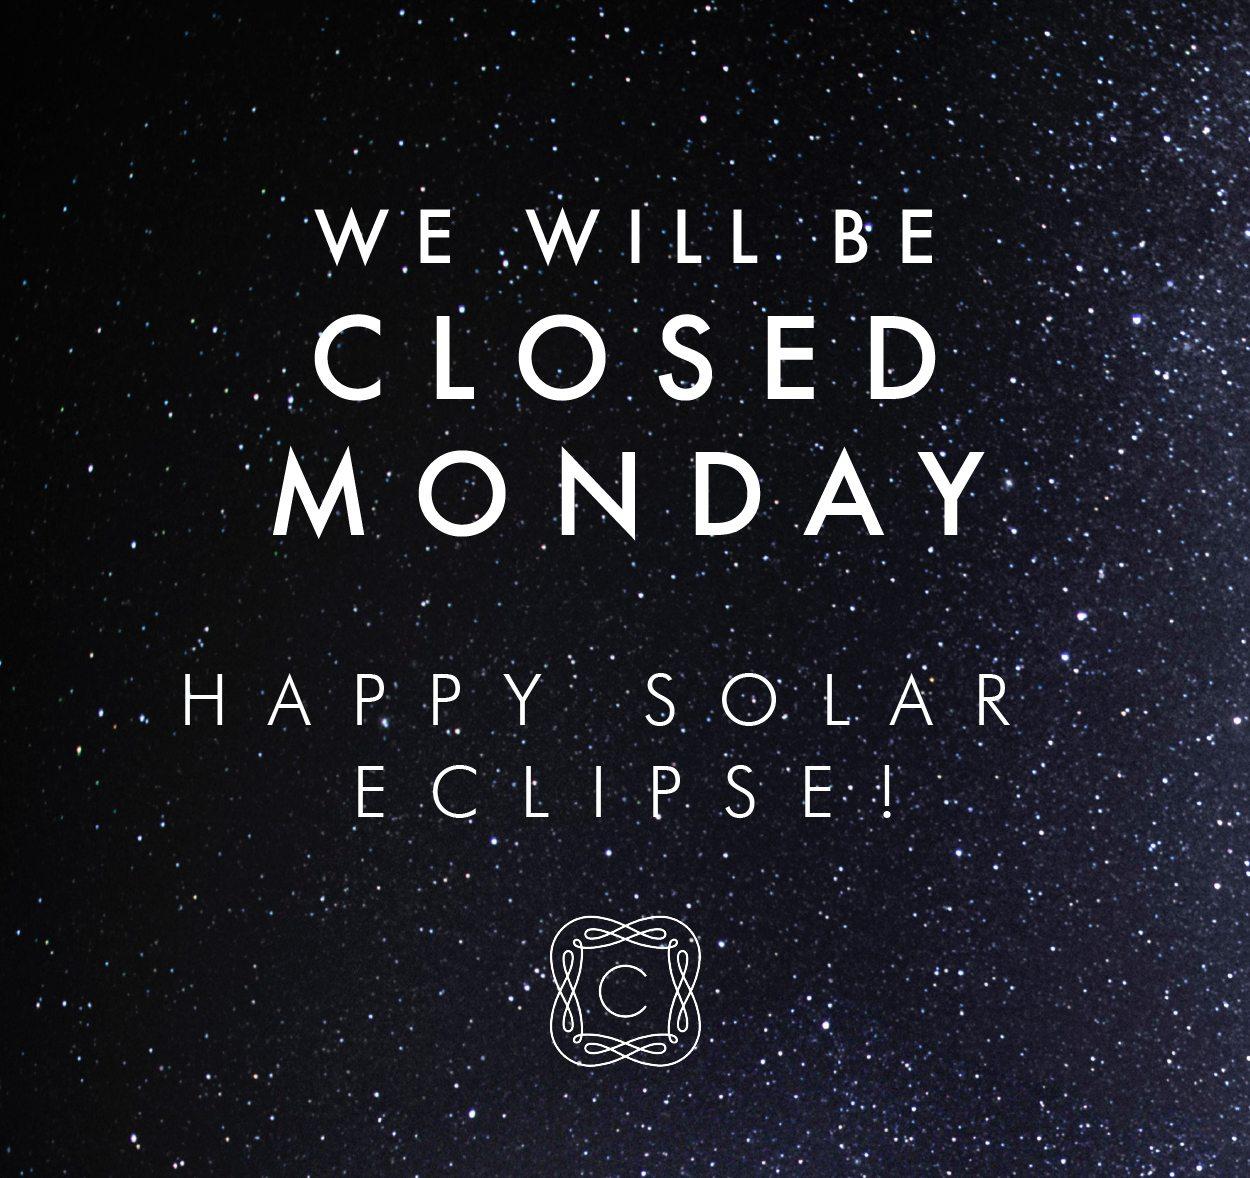 graphic-solar-eclipse